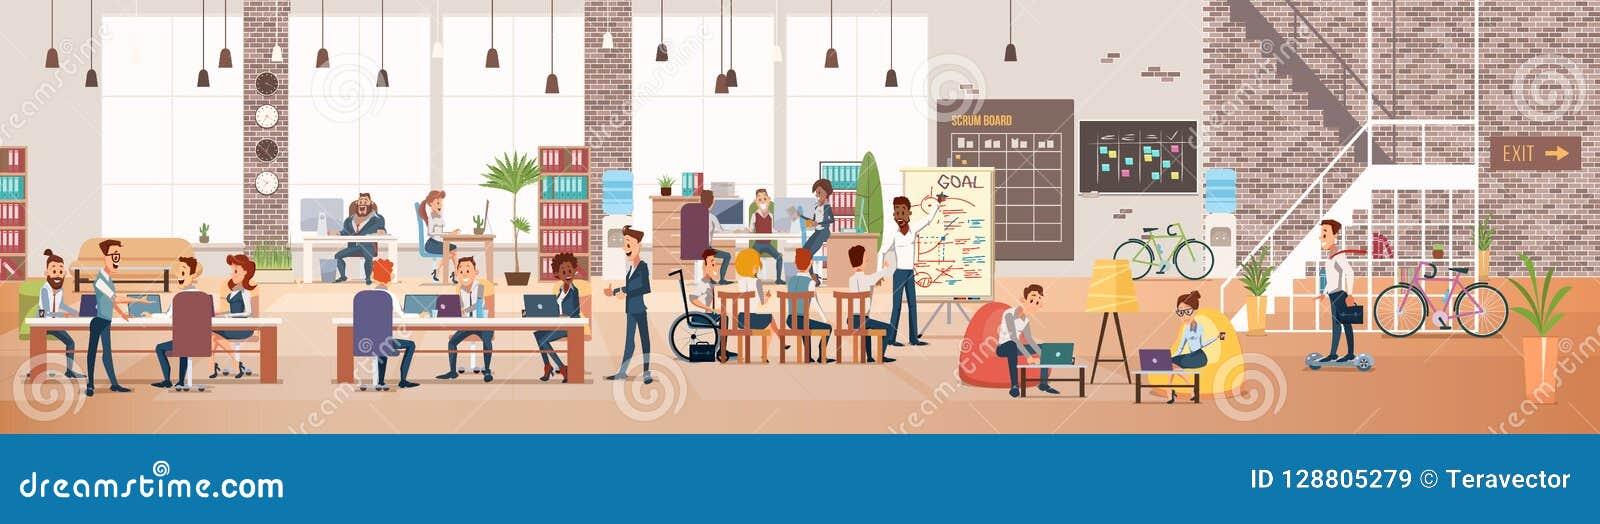 Leutearbeit im Büro Coworking-Arbeitsplatz Vektor